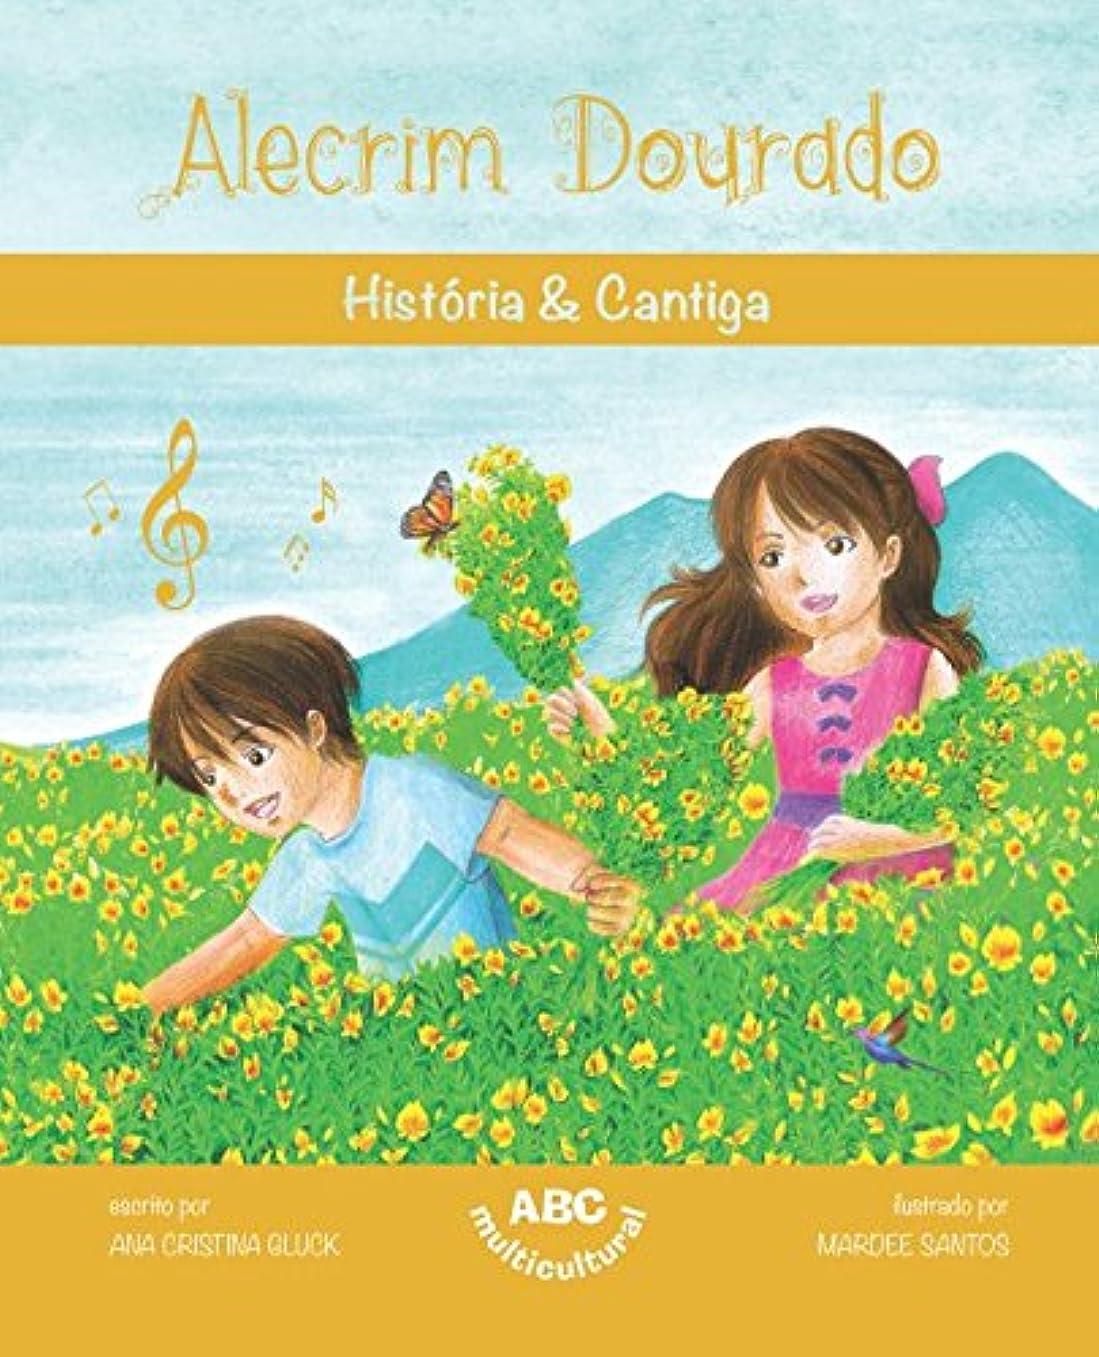 ダム不利窒素Alecrim Dourado (História & Cantiga)